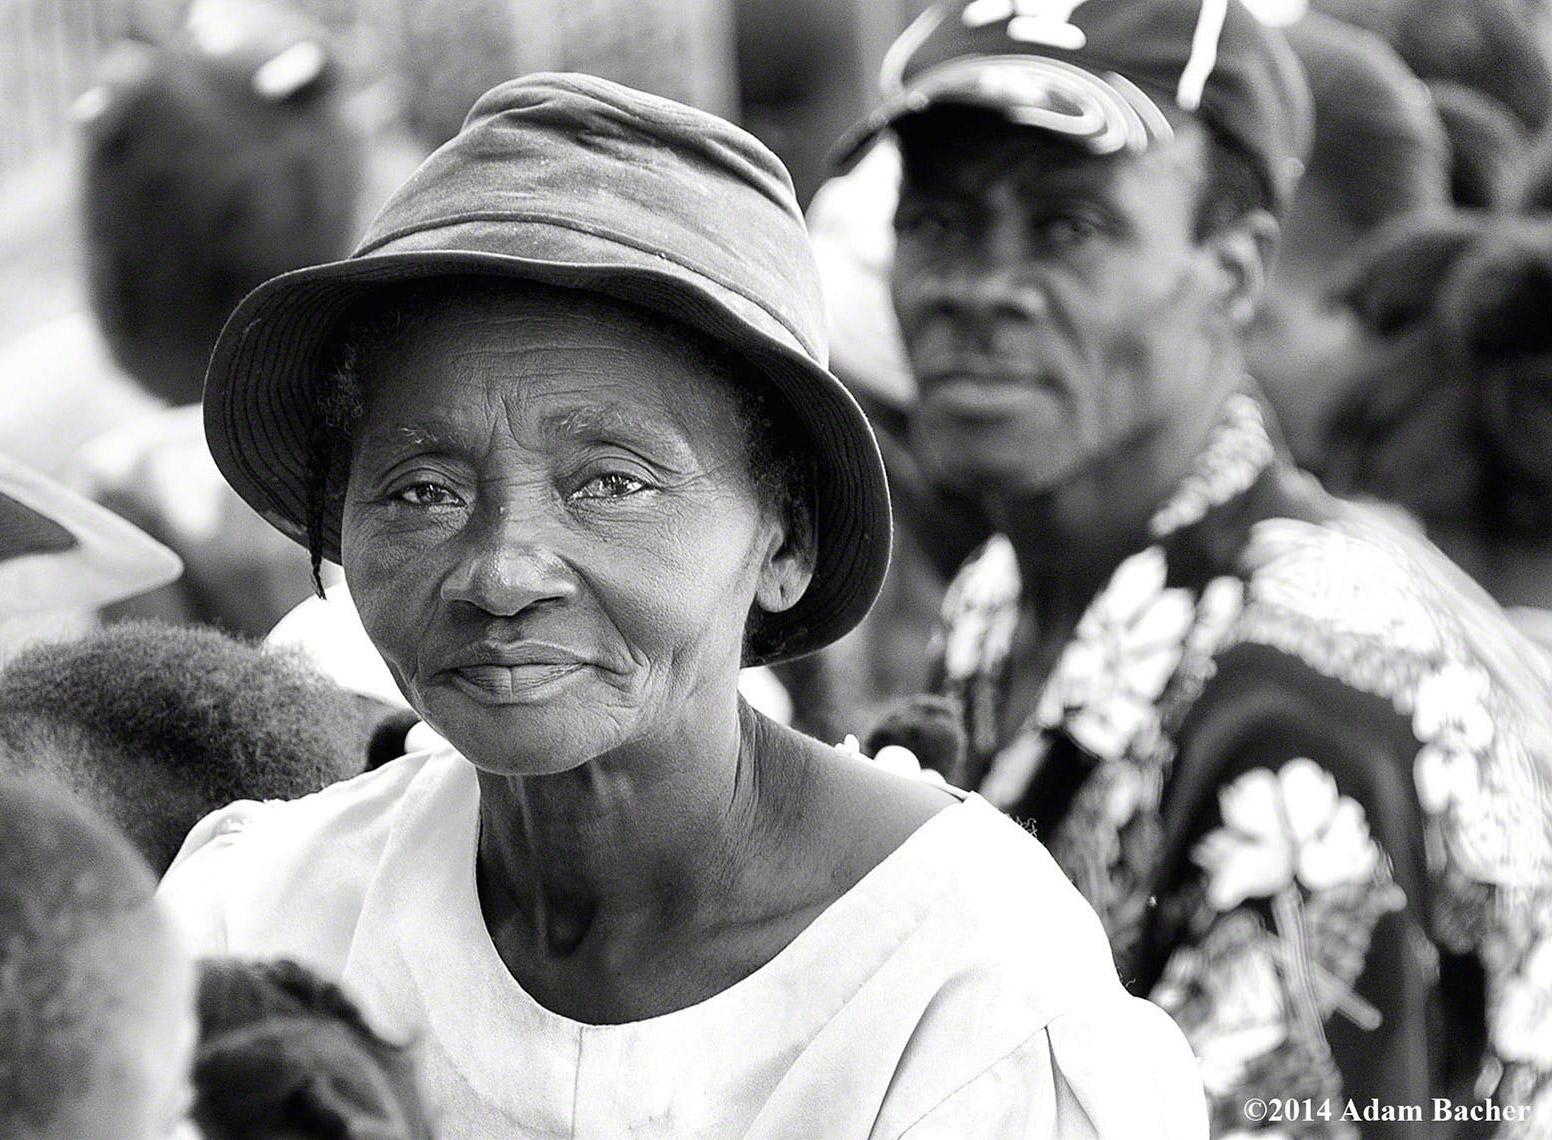 Haiti black and white portrait at medical clinic